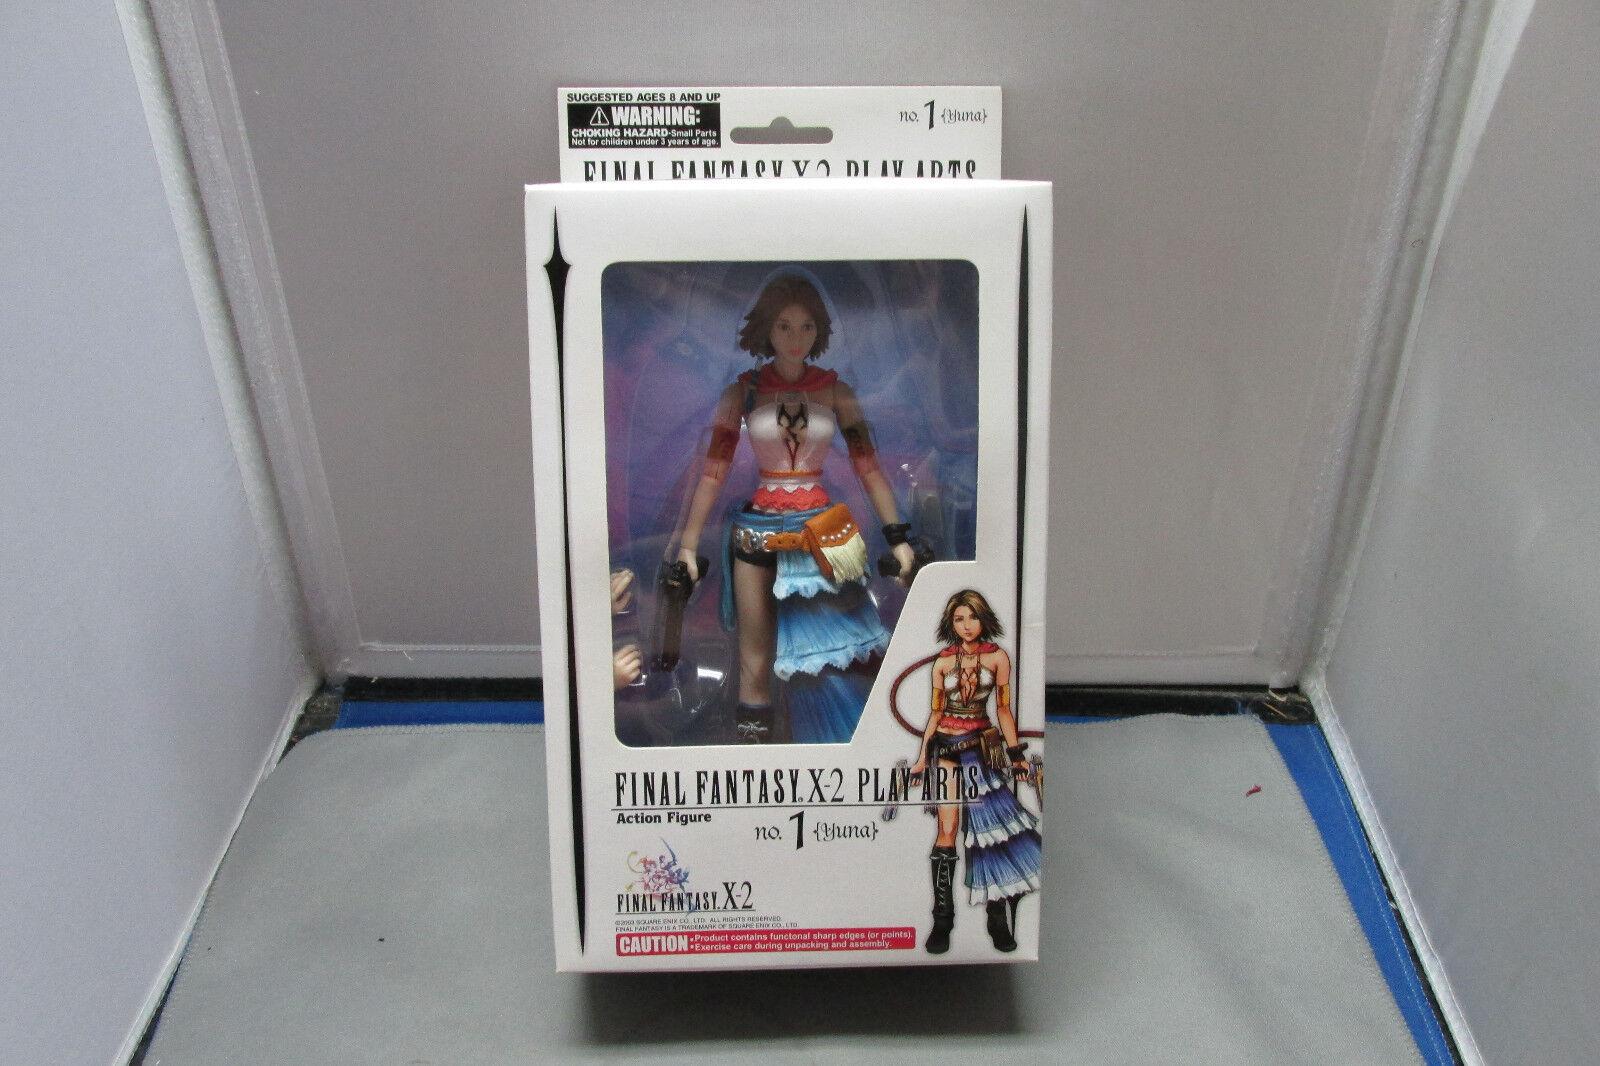 Final Fantasy X-2 Play Arts Action Figure No. 1 Yuna  MIB  Sealed   No Reserve